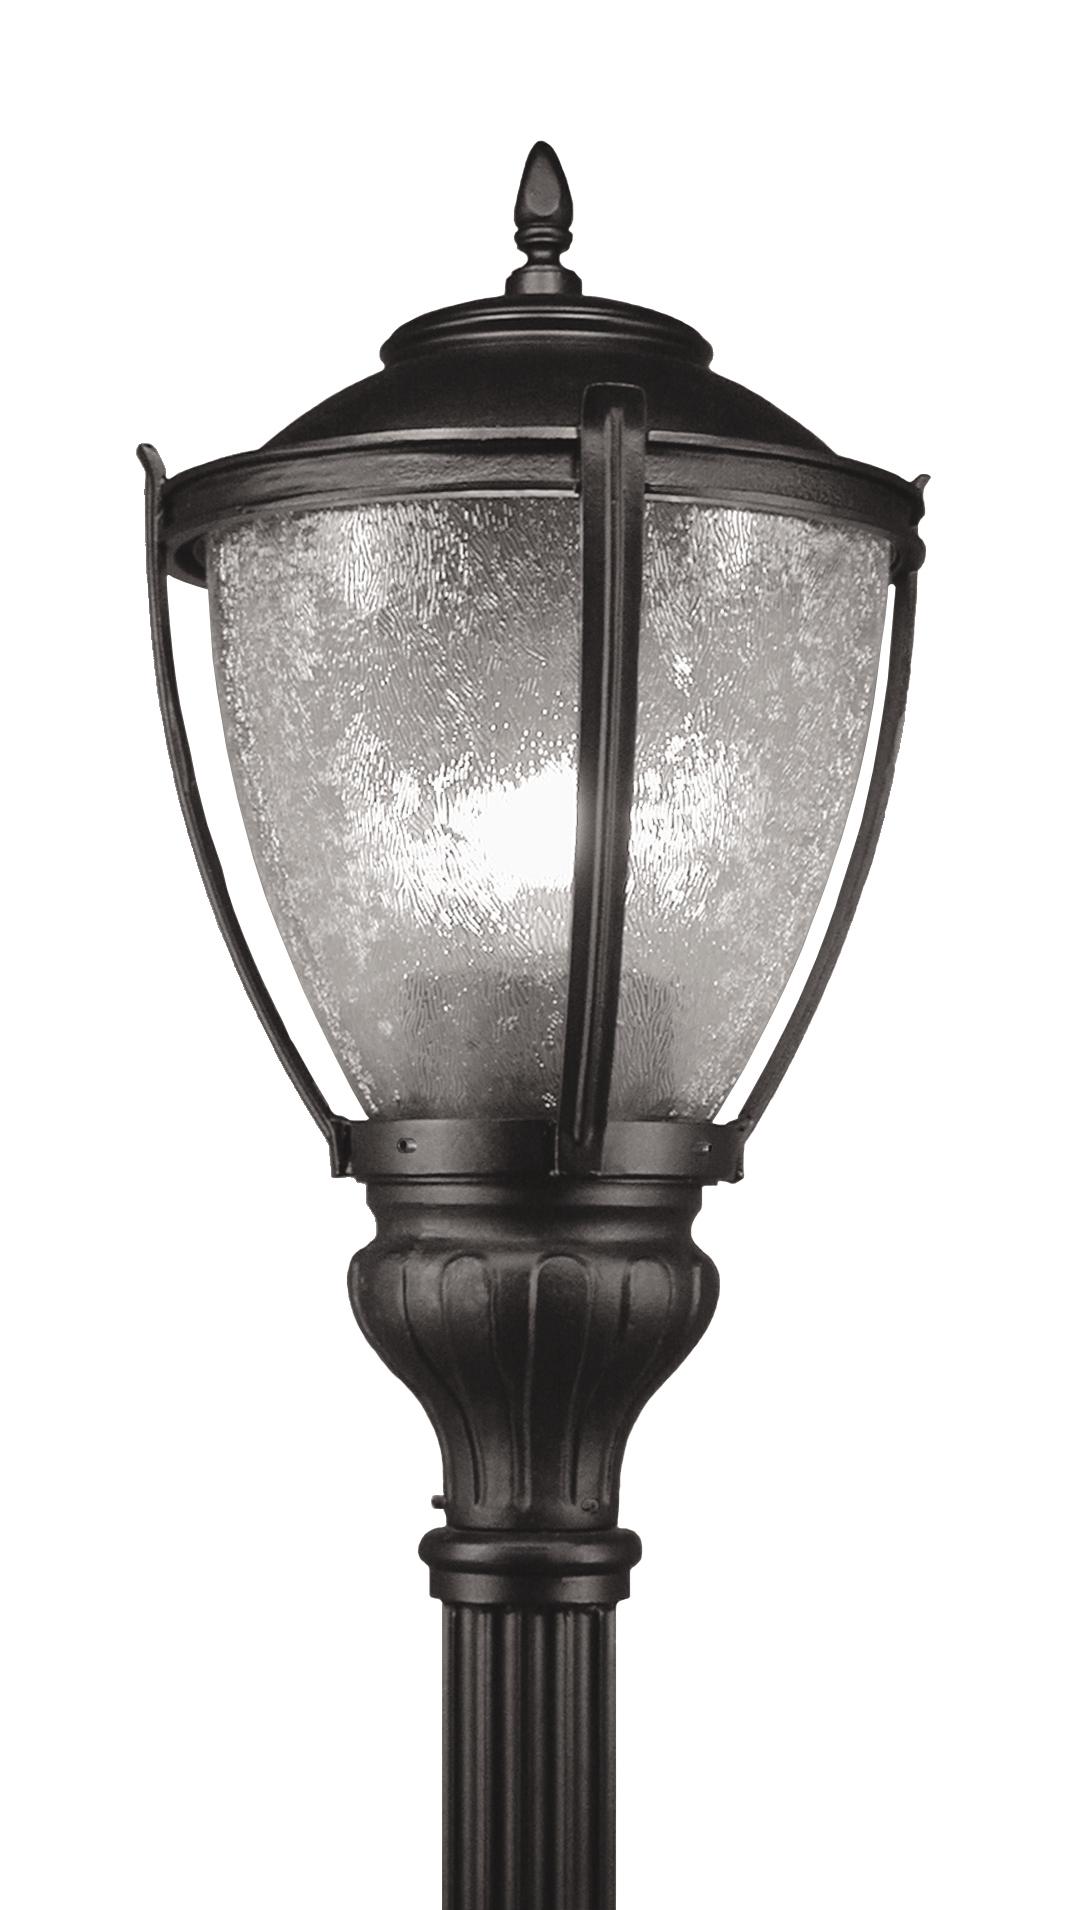 Amerlux Commercial Lighting Manufacturer